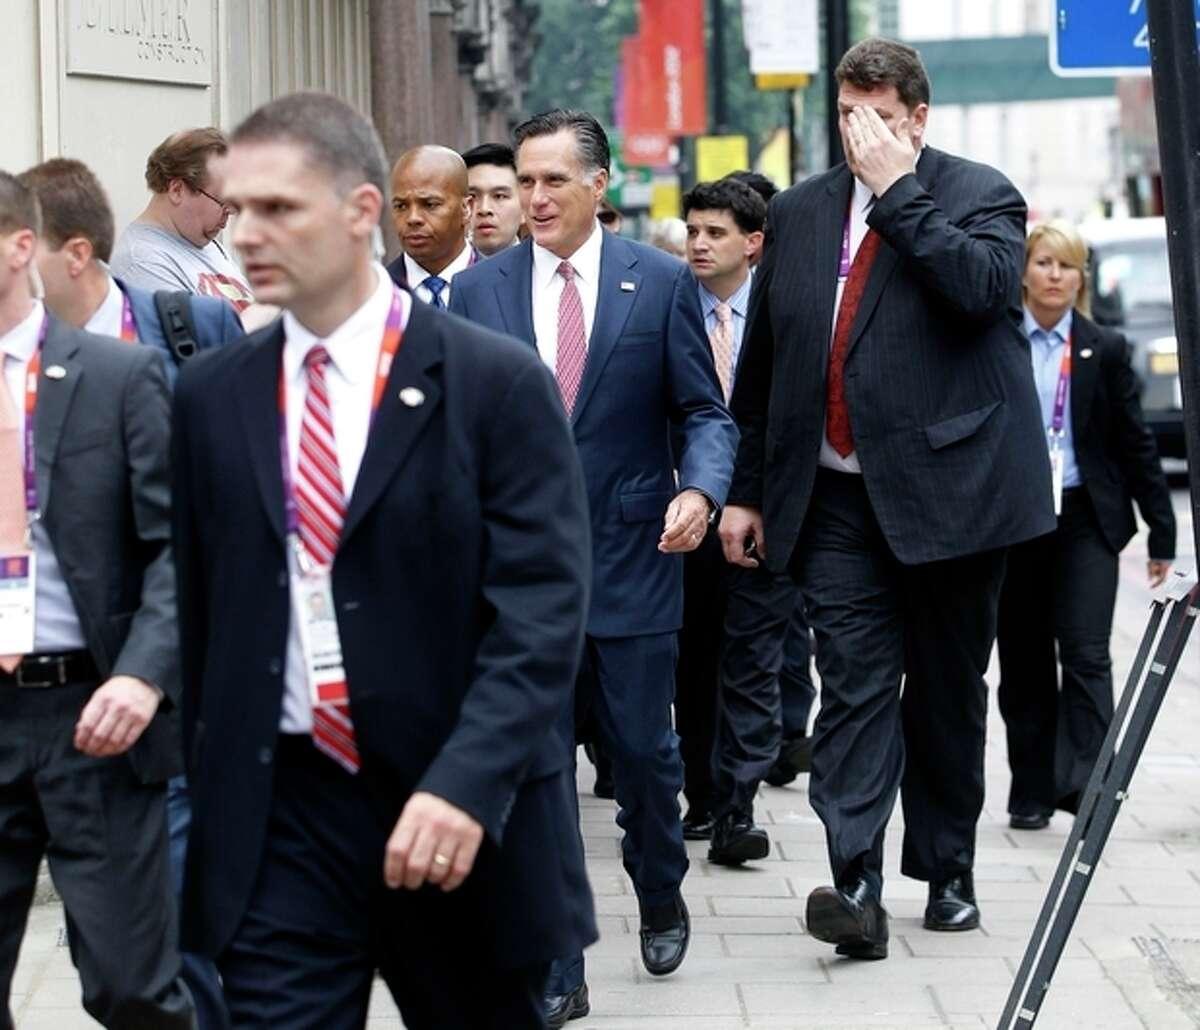 Avoiding a traffic jam, Republican presidential candidate, former Massachusetts Gov. Mitt Romney walks down Grosvenor Place in London to meet Ireland's Prime Minister Enda Kenny at the Embassy of Ireland in London, Friday, July 27, 2012. (AP Photo/Charles Dharapak)